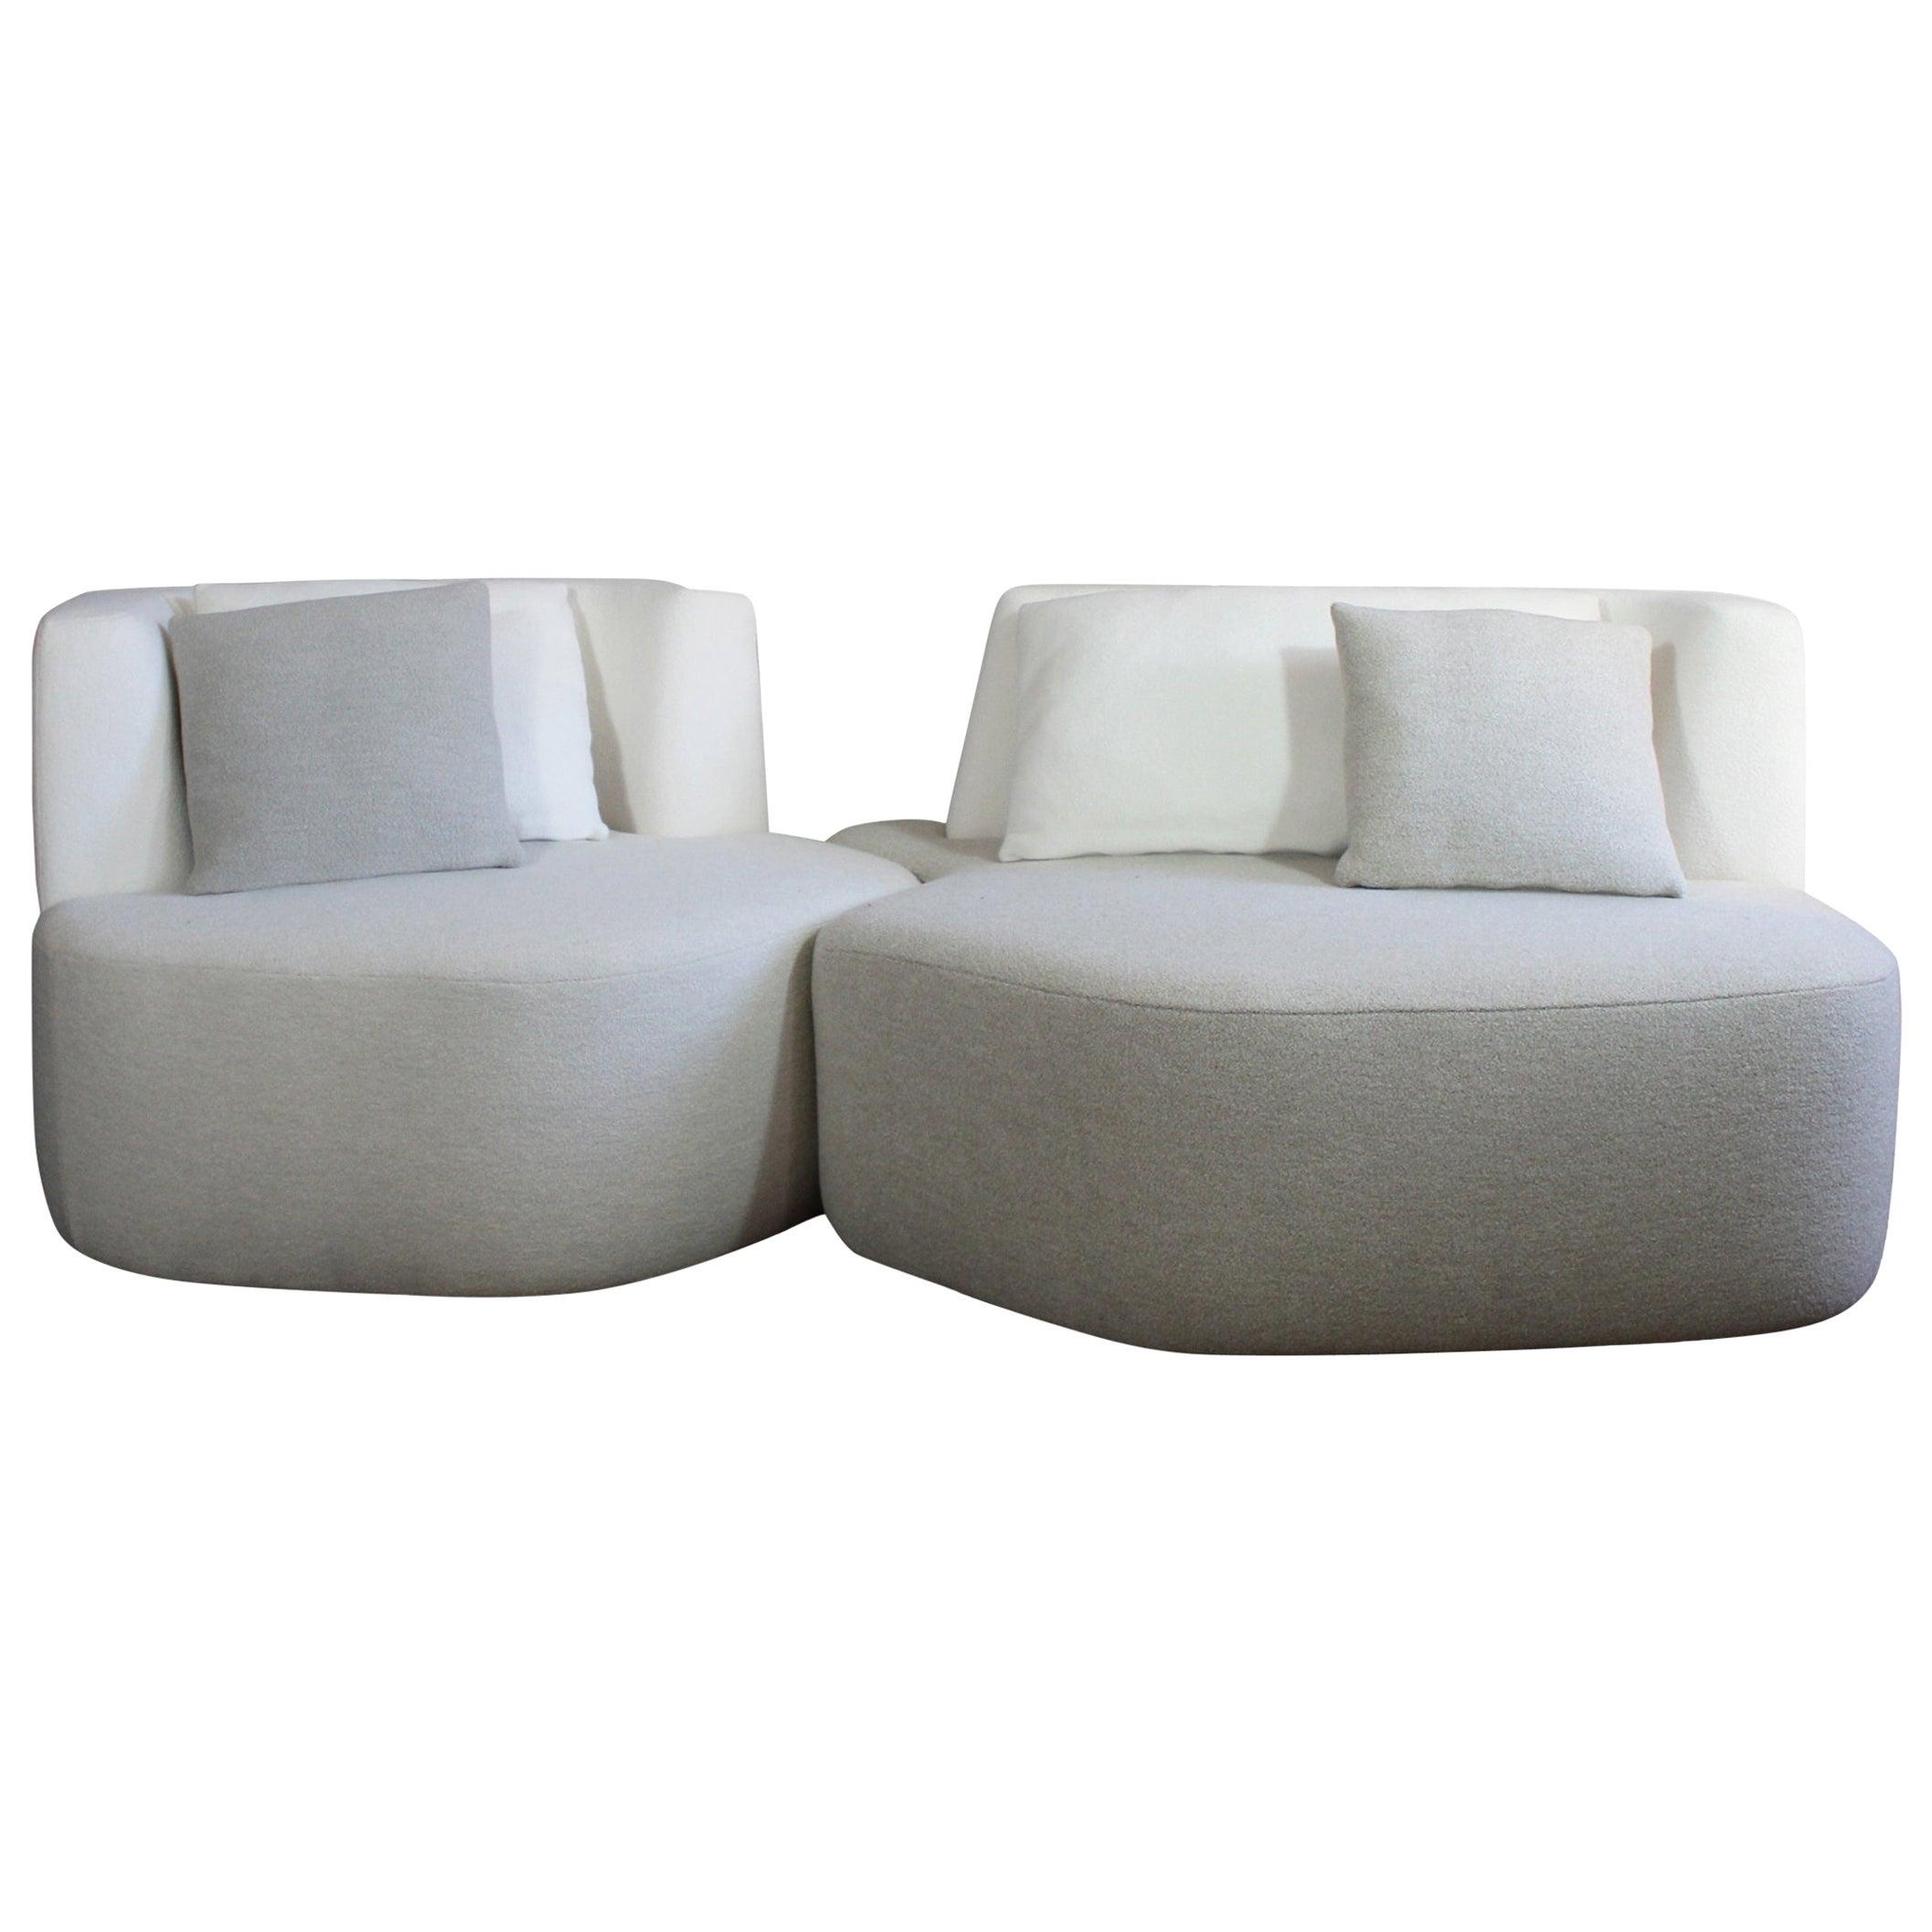 Bespoke Organic Sofa in White Cream Wool 2 Modules Made in France by Eric Gizard